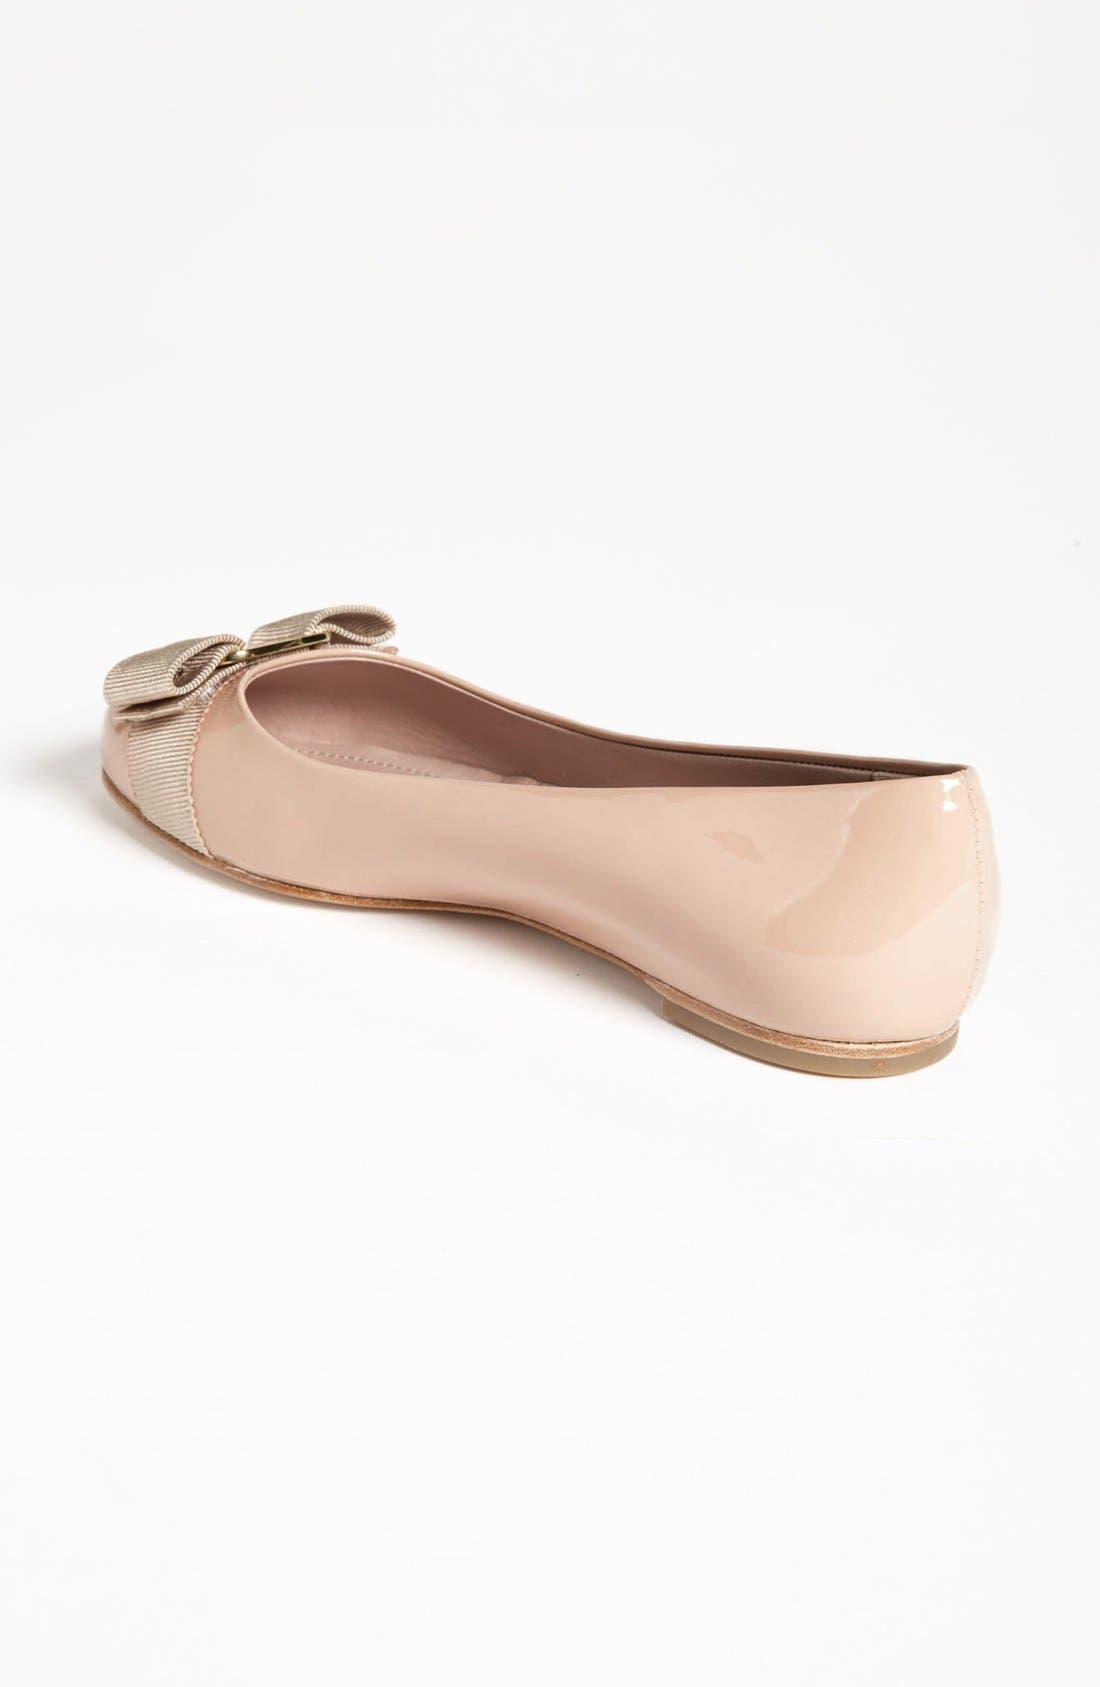 Alternate Image 2  - Salvatore Ferragamo 'Varina' Leather Flat (Women)